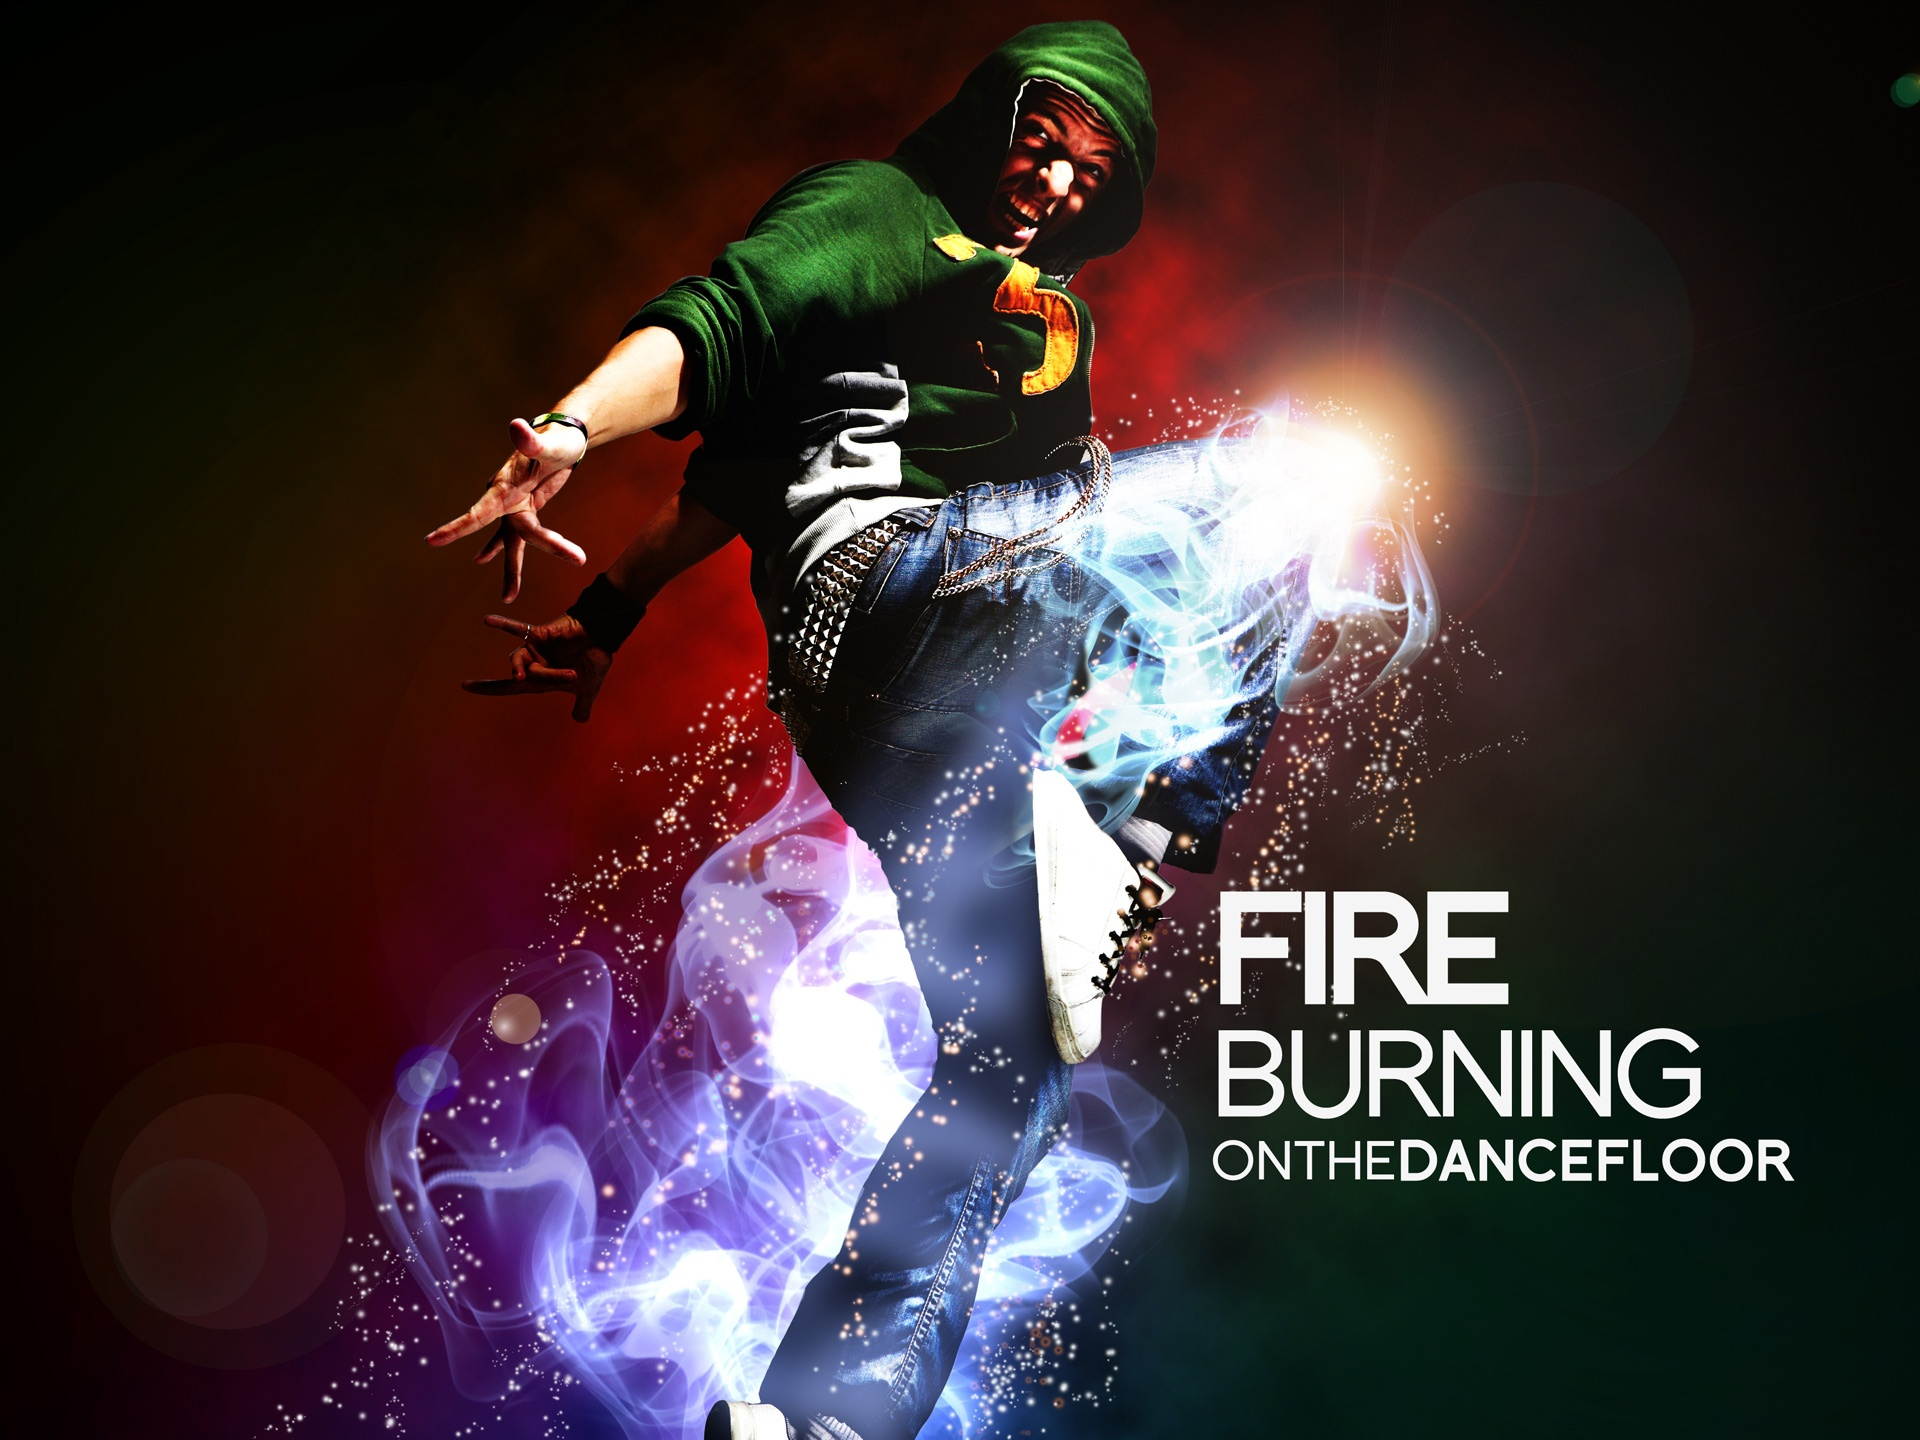 1920x1440 fire burnin on the dancefloor wallpaper music for 123 get on the dance floor song download